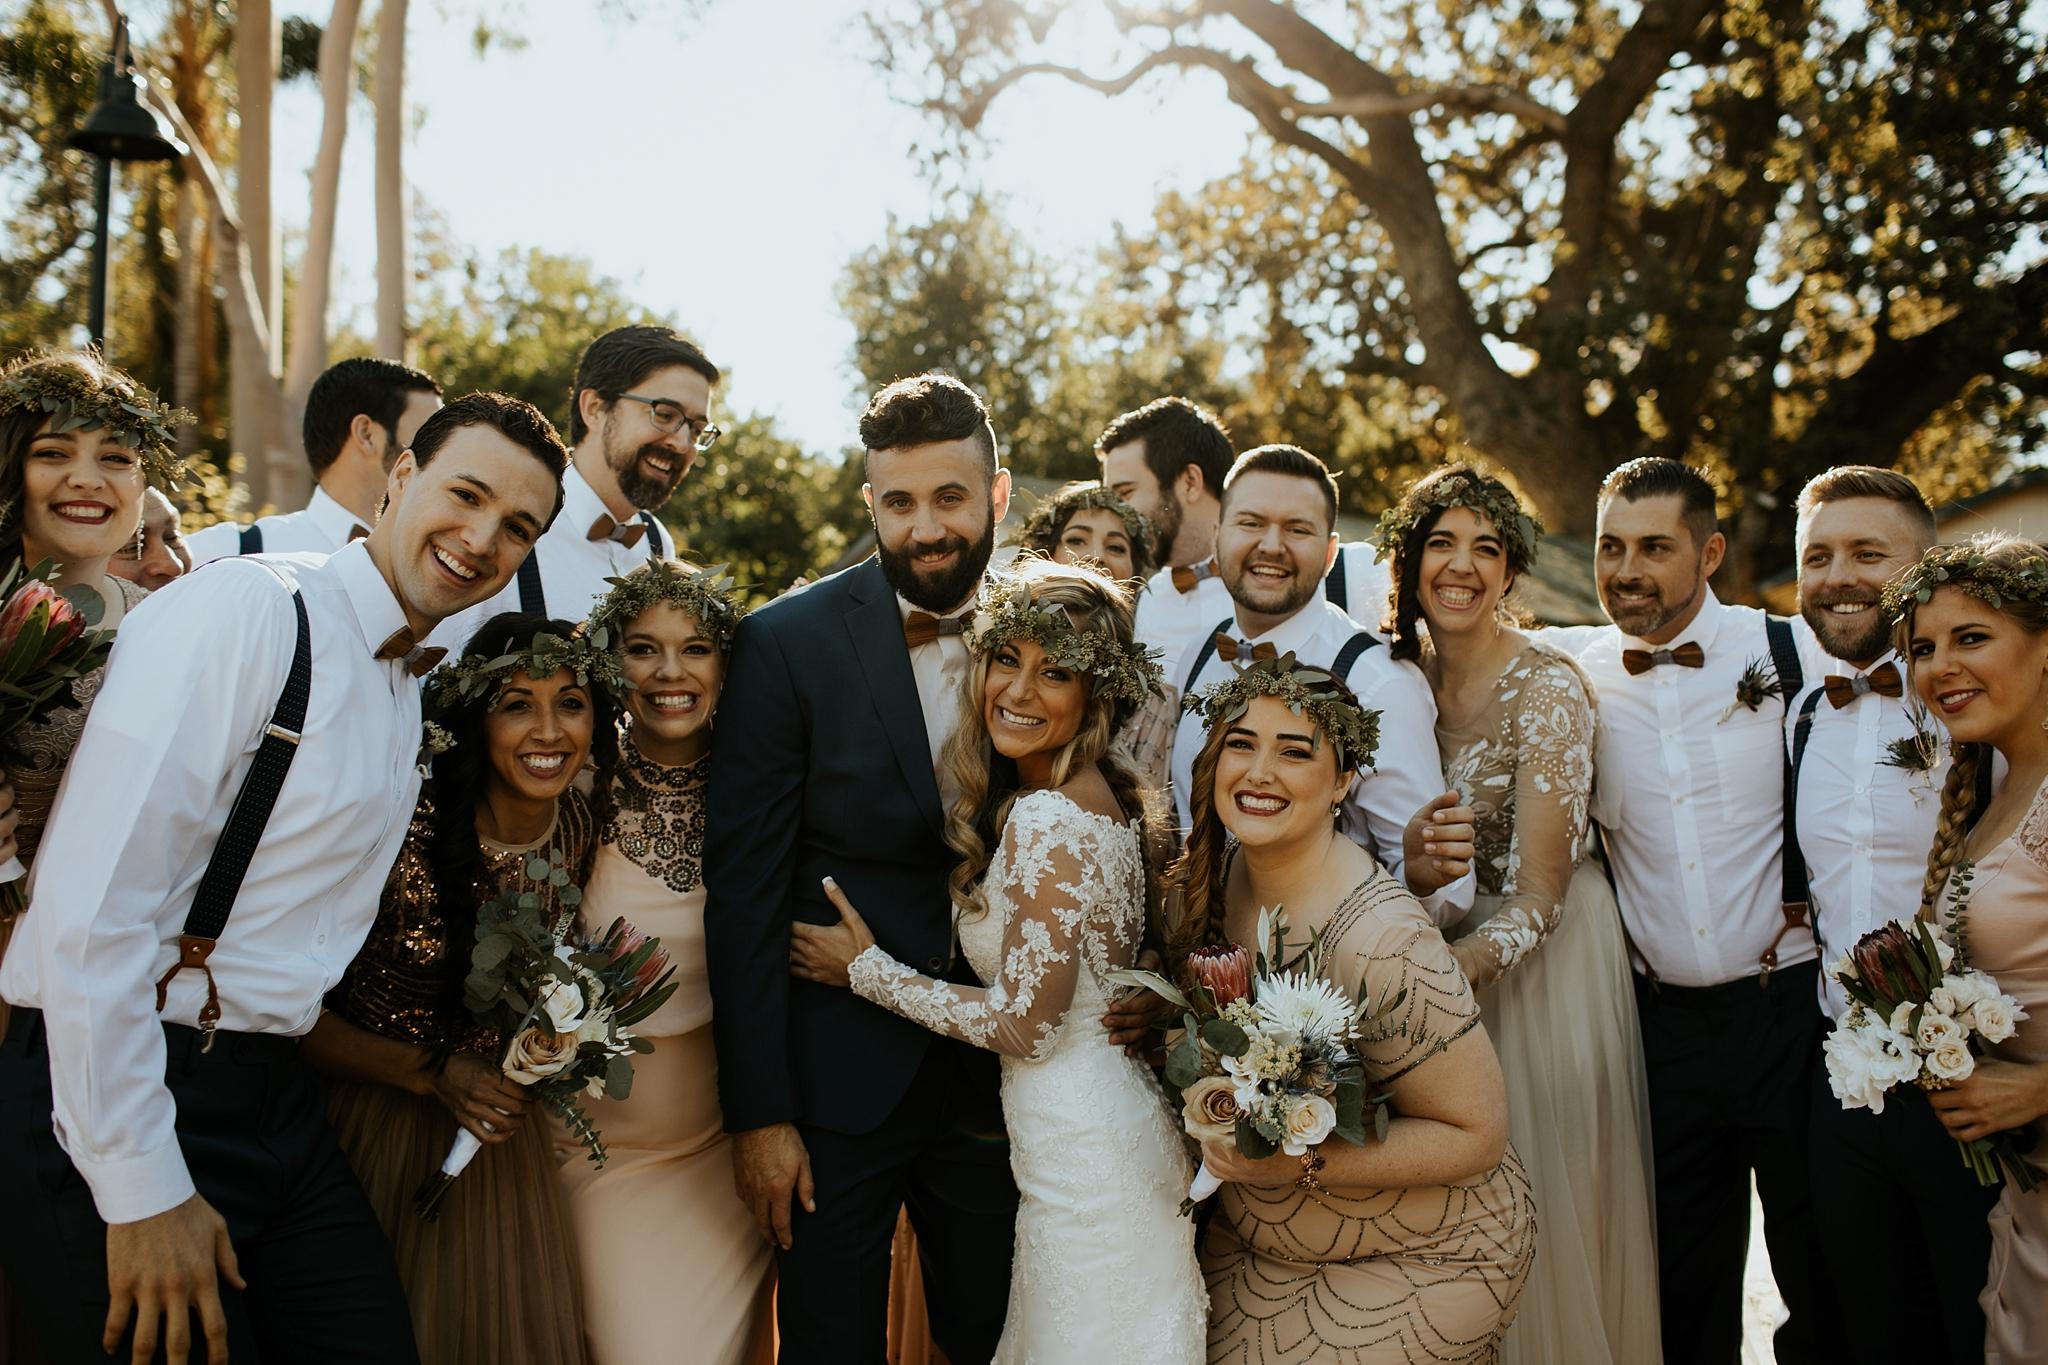 Bohemian Orcutt Ranch Wedding in Los Angeles California  - Los Angeles Californai Wedding Photographer_0023.jpg